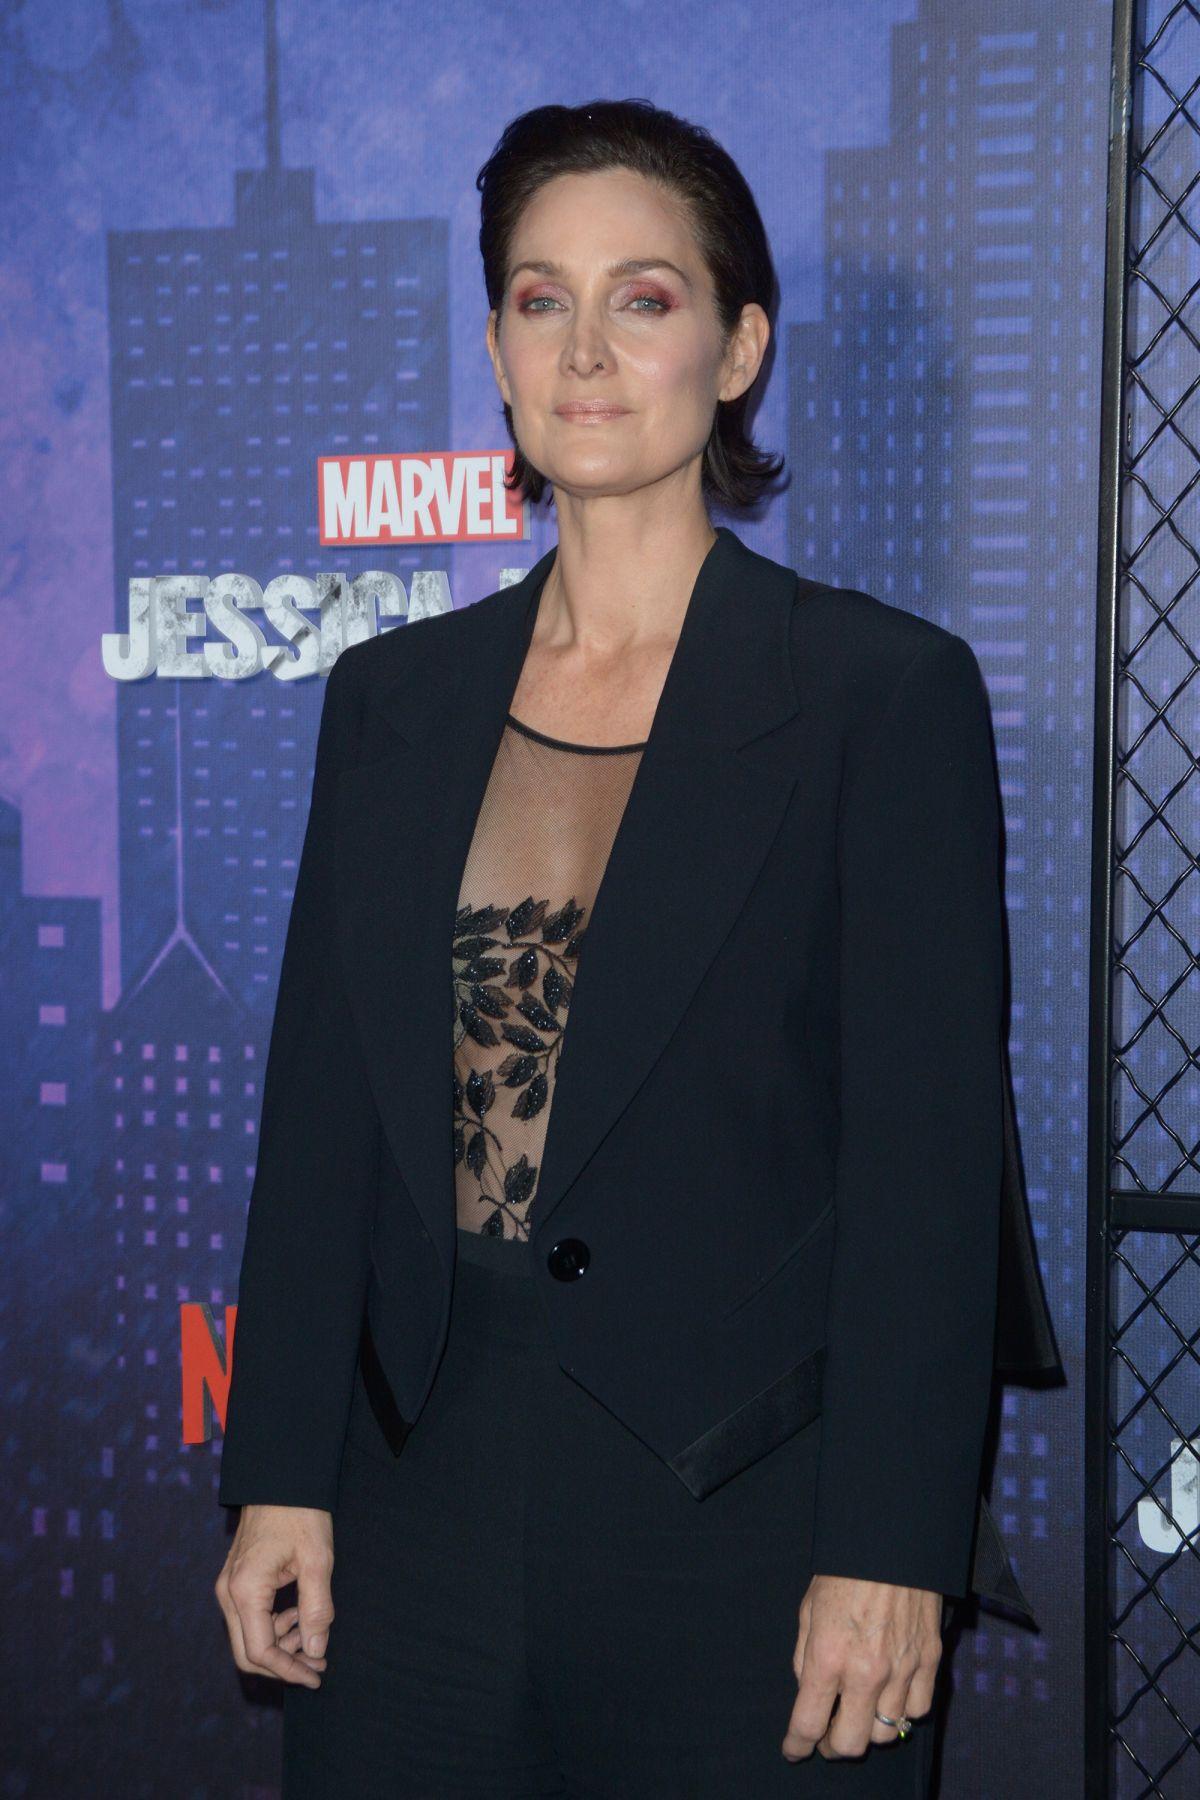 Carrie Anne Moss At Jessica Jones Season 2 Premiere In New